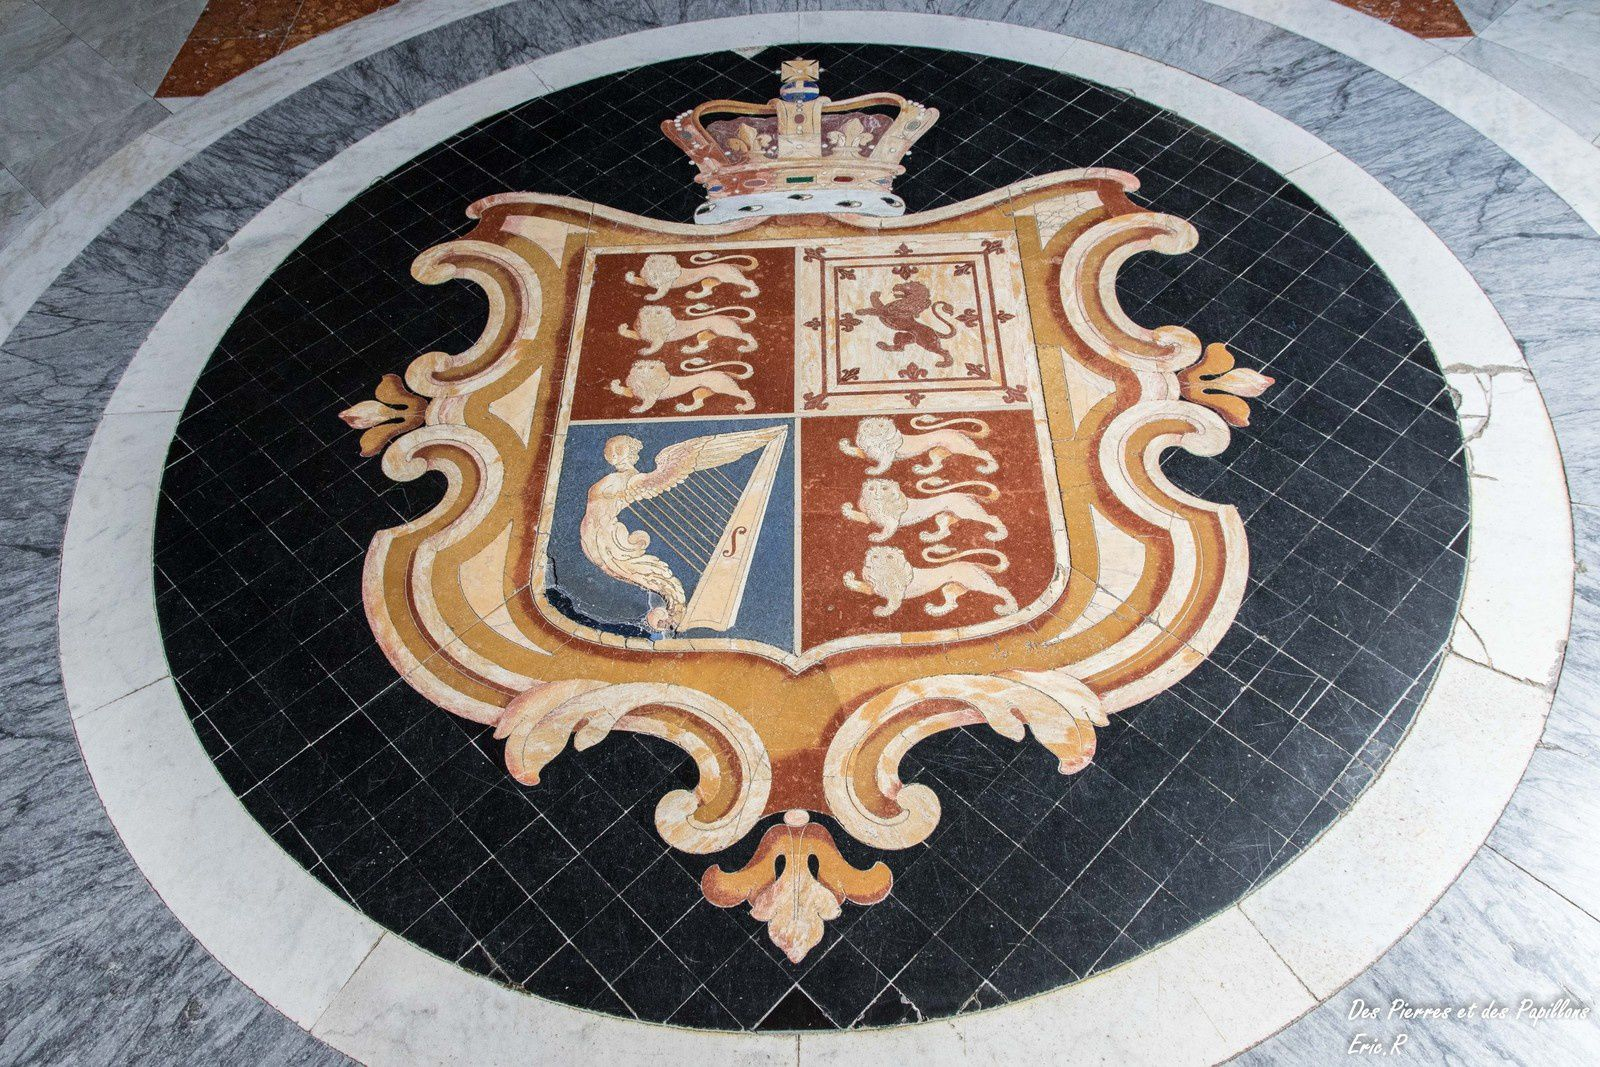 Vues du palais des grands maîtres de l'ordre de Malte